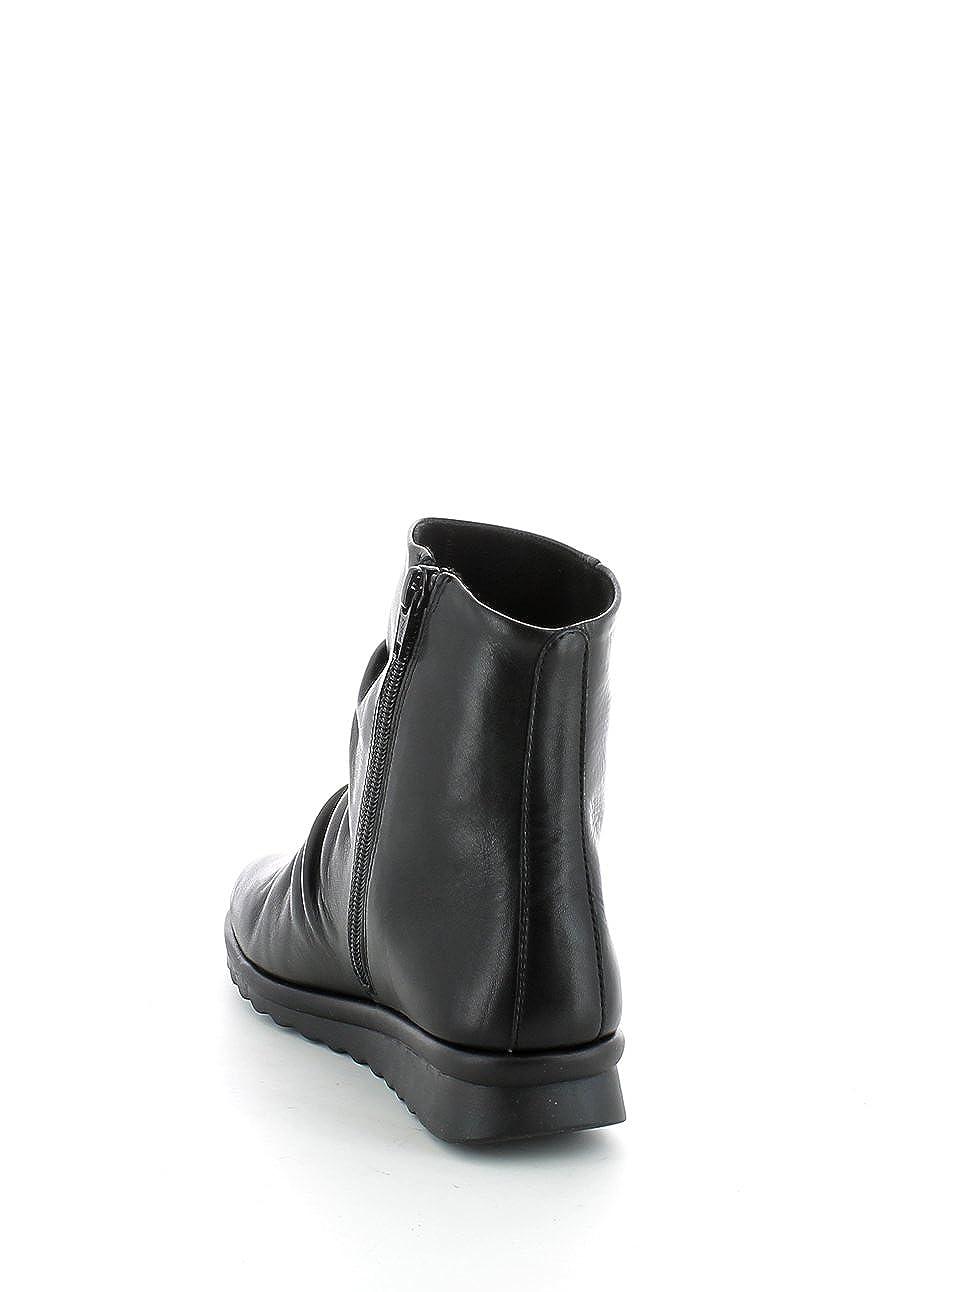 le flexx bottes pour dames Noir nero, nero, nero, noir